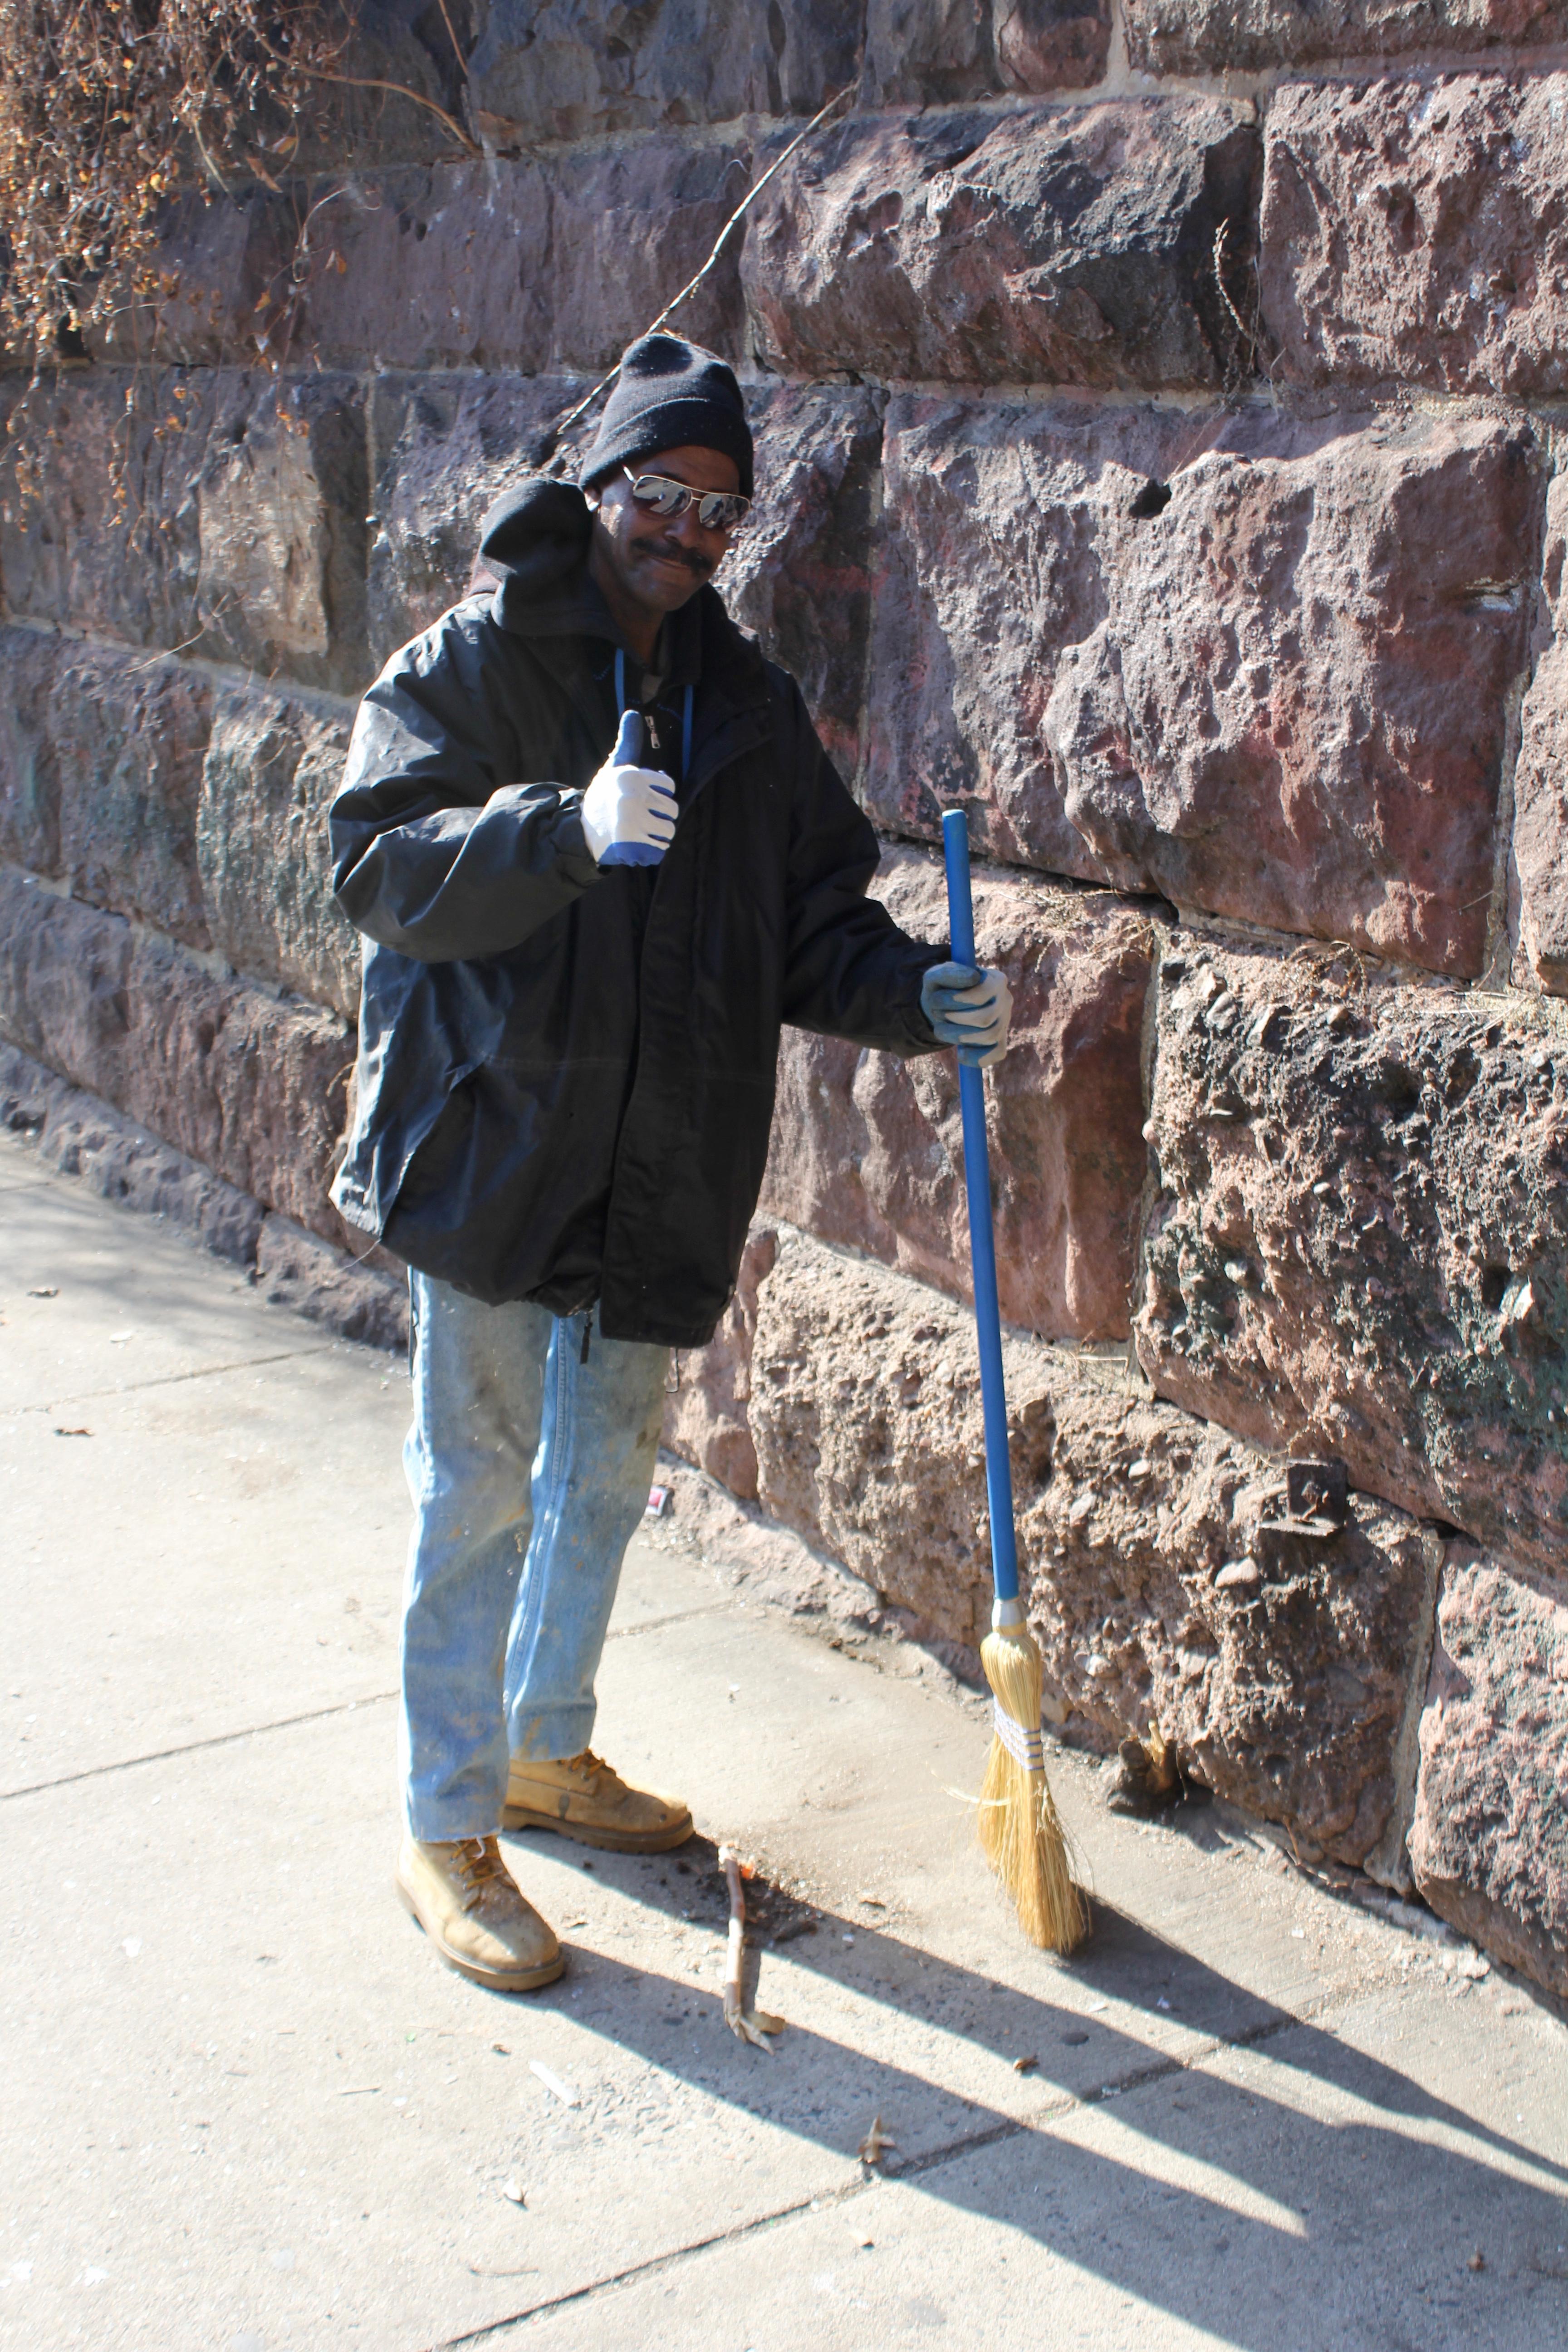 Community Service Organization - North 5th Street Revitalization Program  3